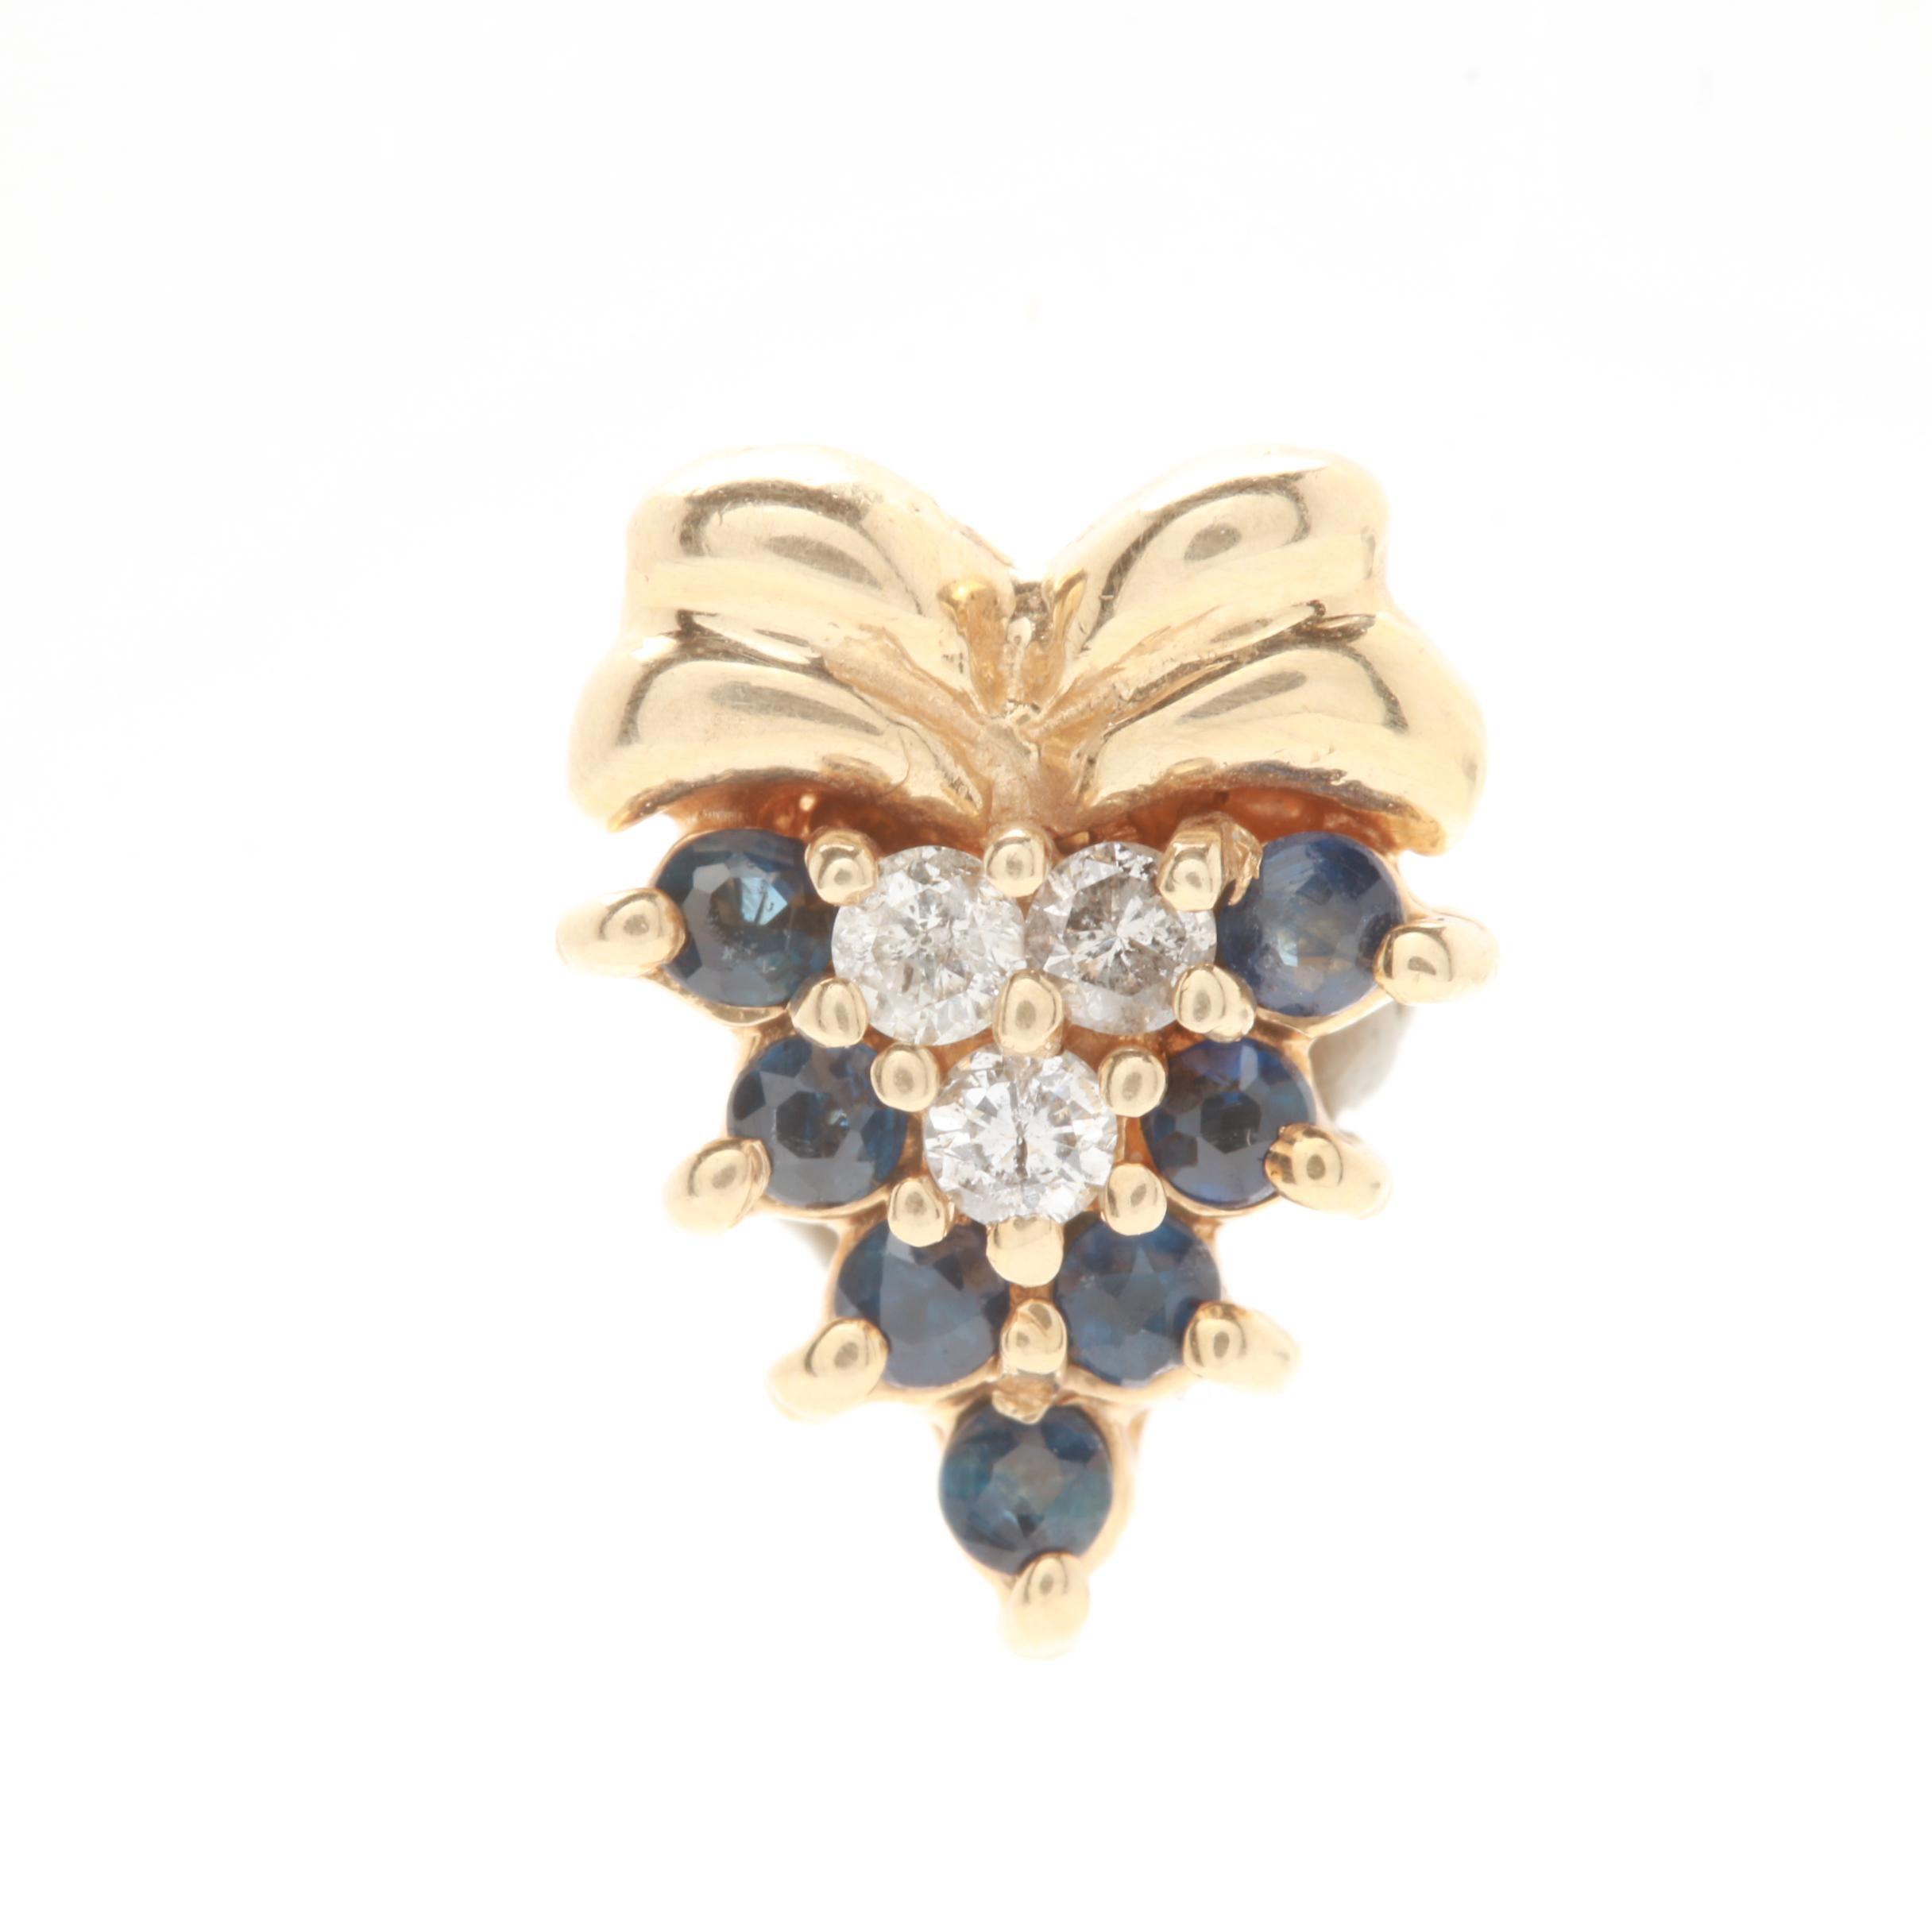 14K Yellow Gold Sapphire and Diamond Slide Pendant